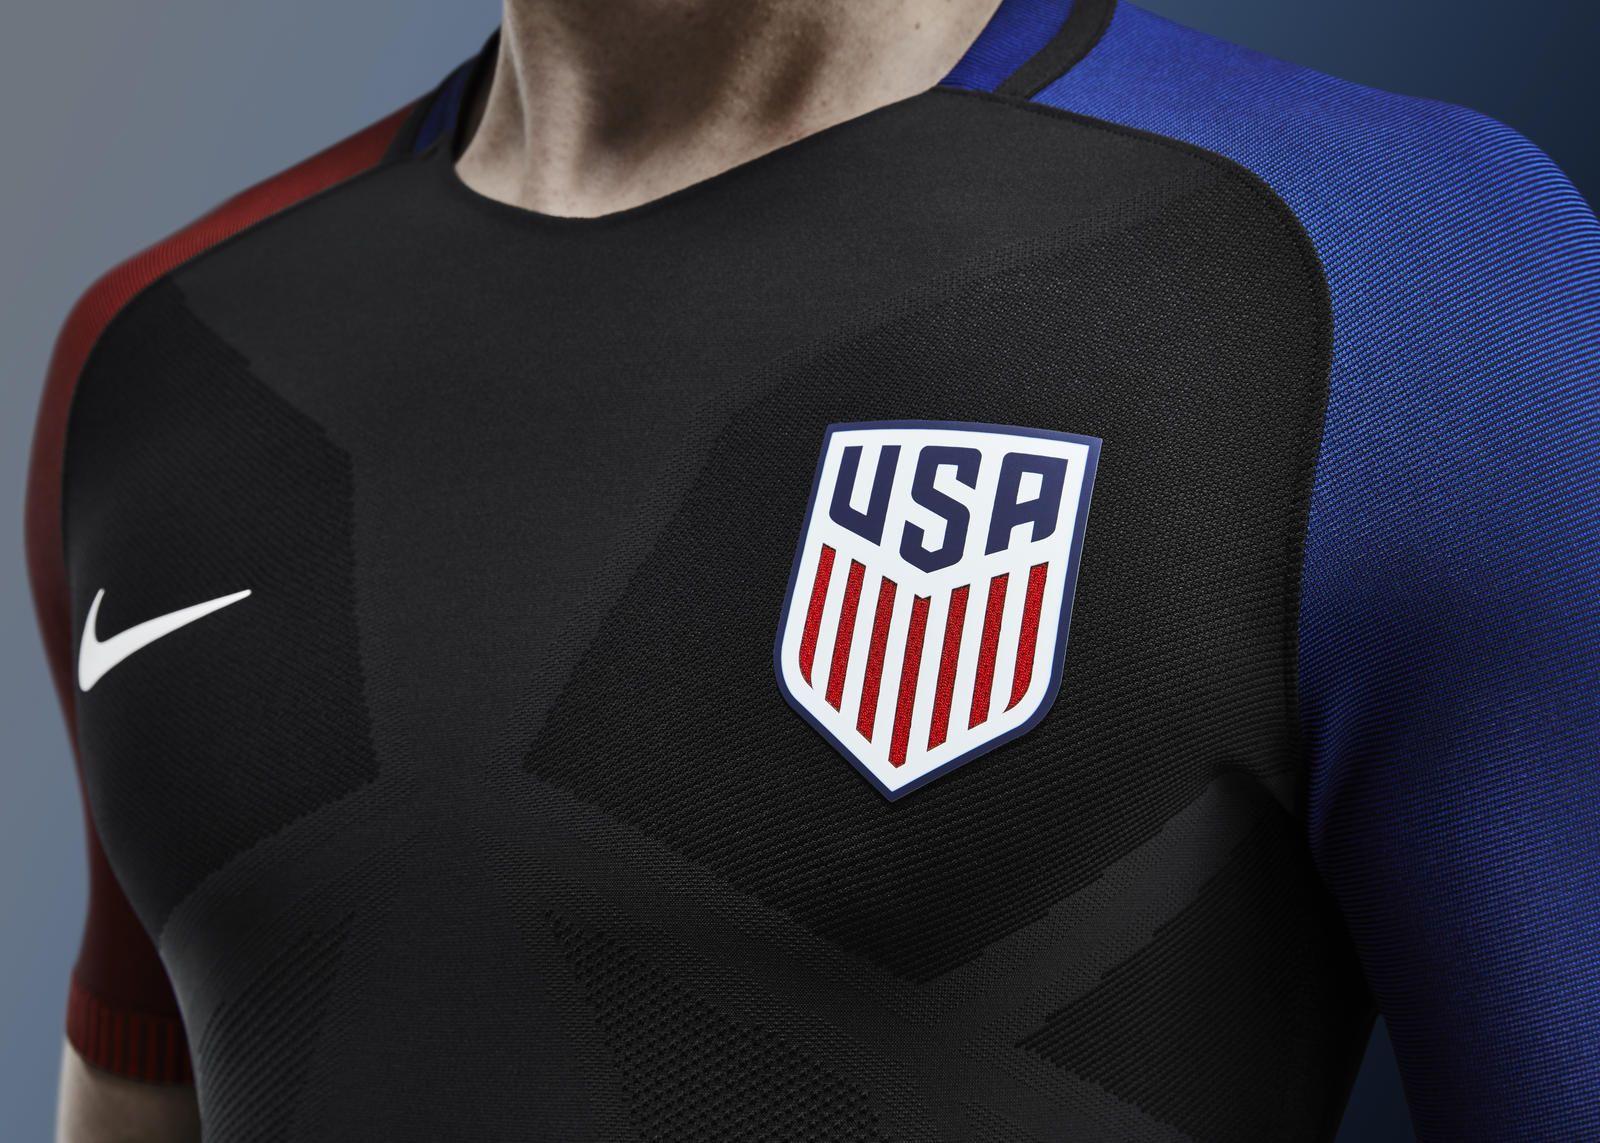 1f1b9a515 Nike News - USA 2016 National Men and Women s Soccer Kits